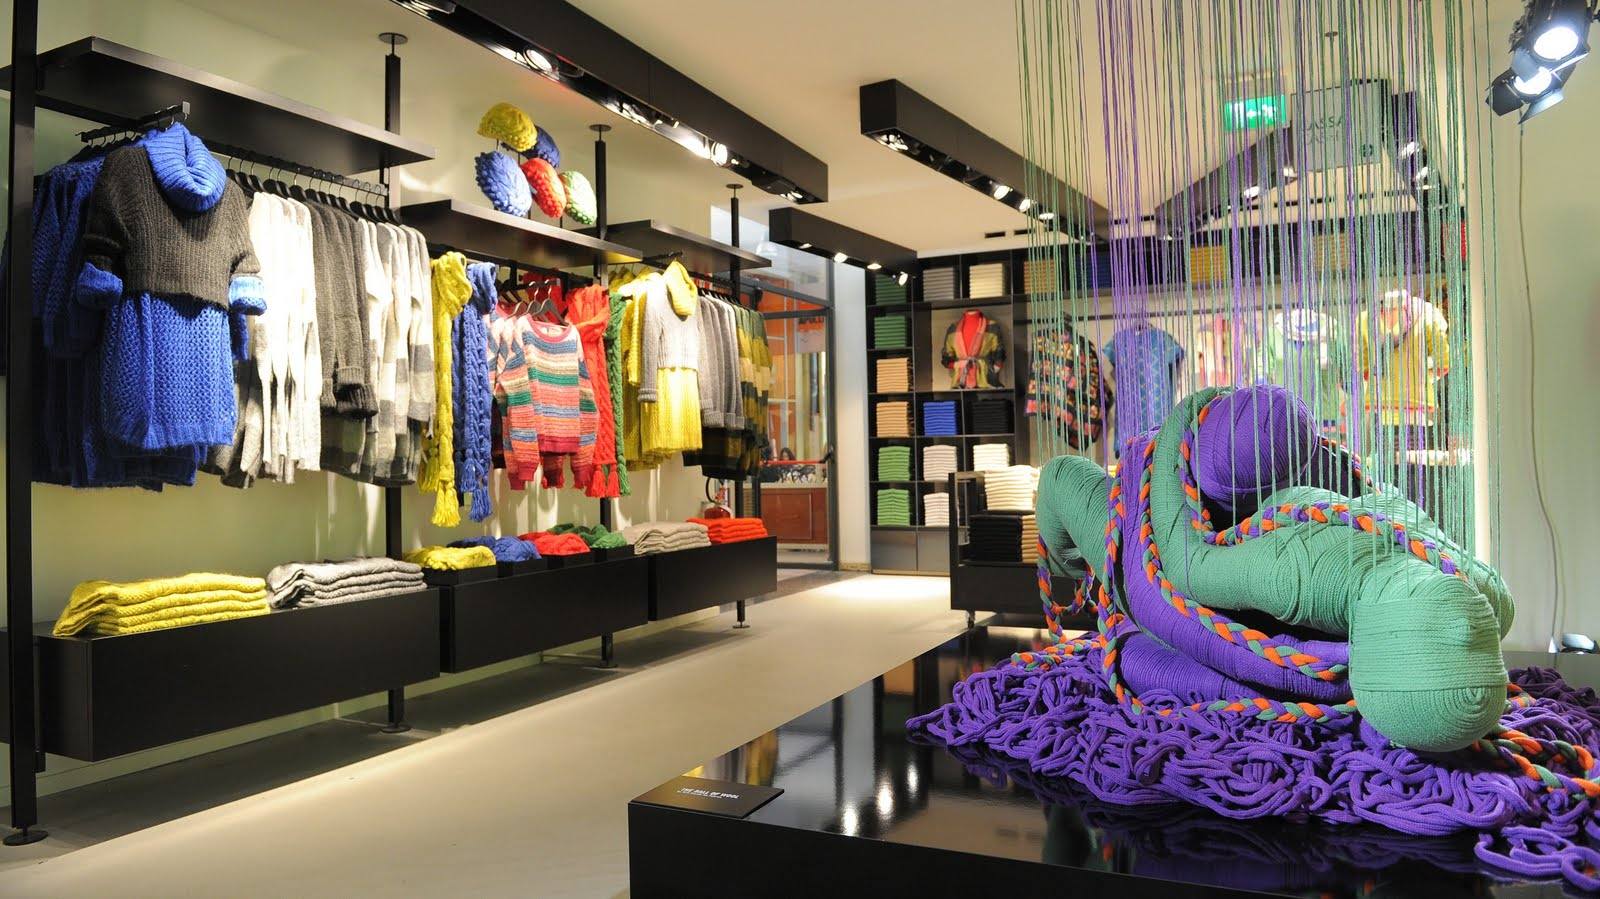 visual merchandising lanasutraartinstallation - ¿Qué es el visual merchandising y por qué es importante?